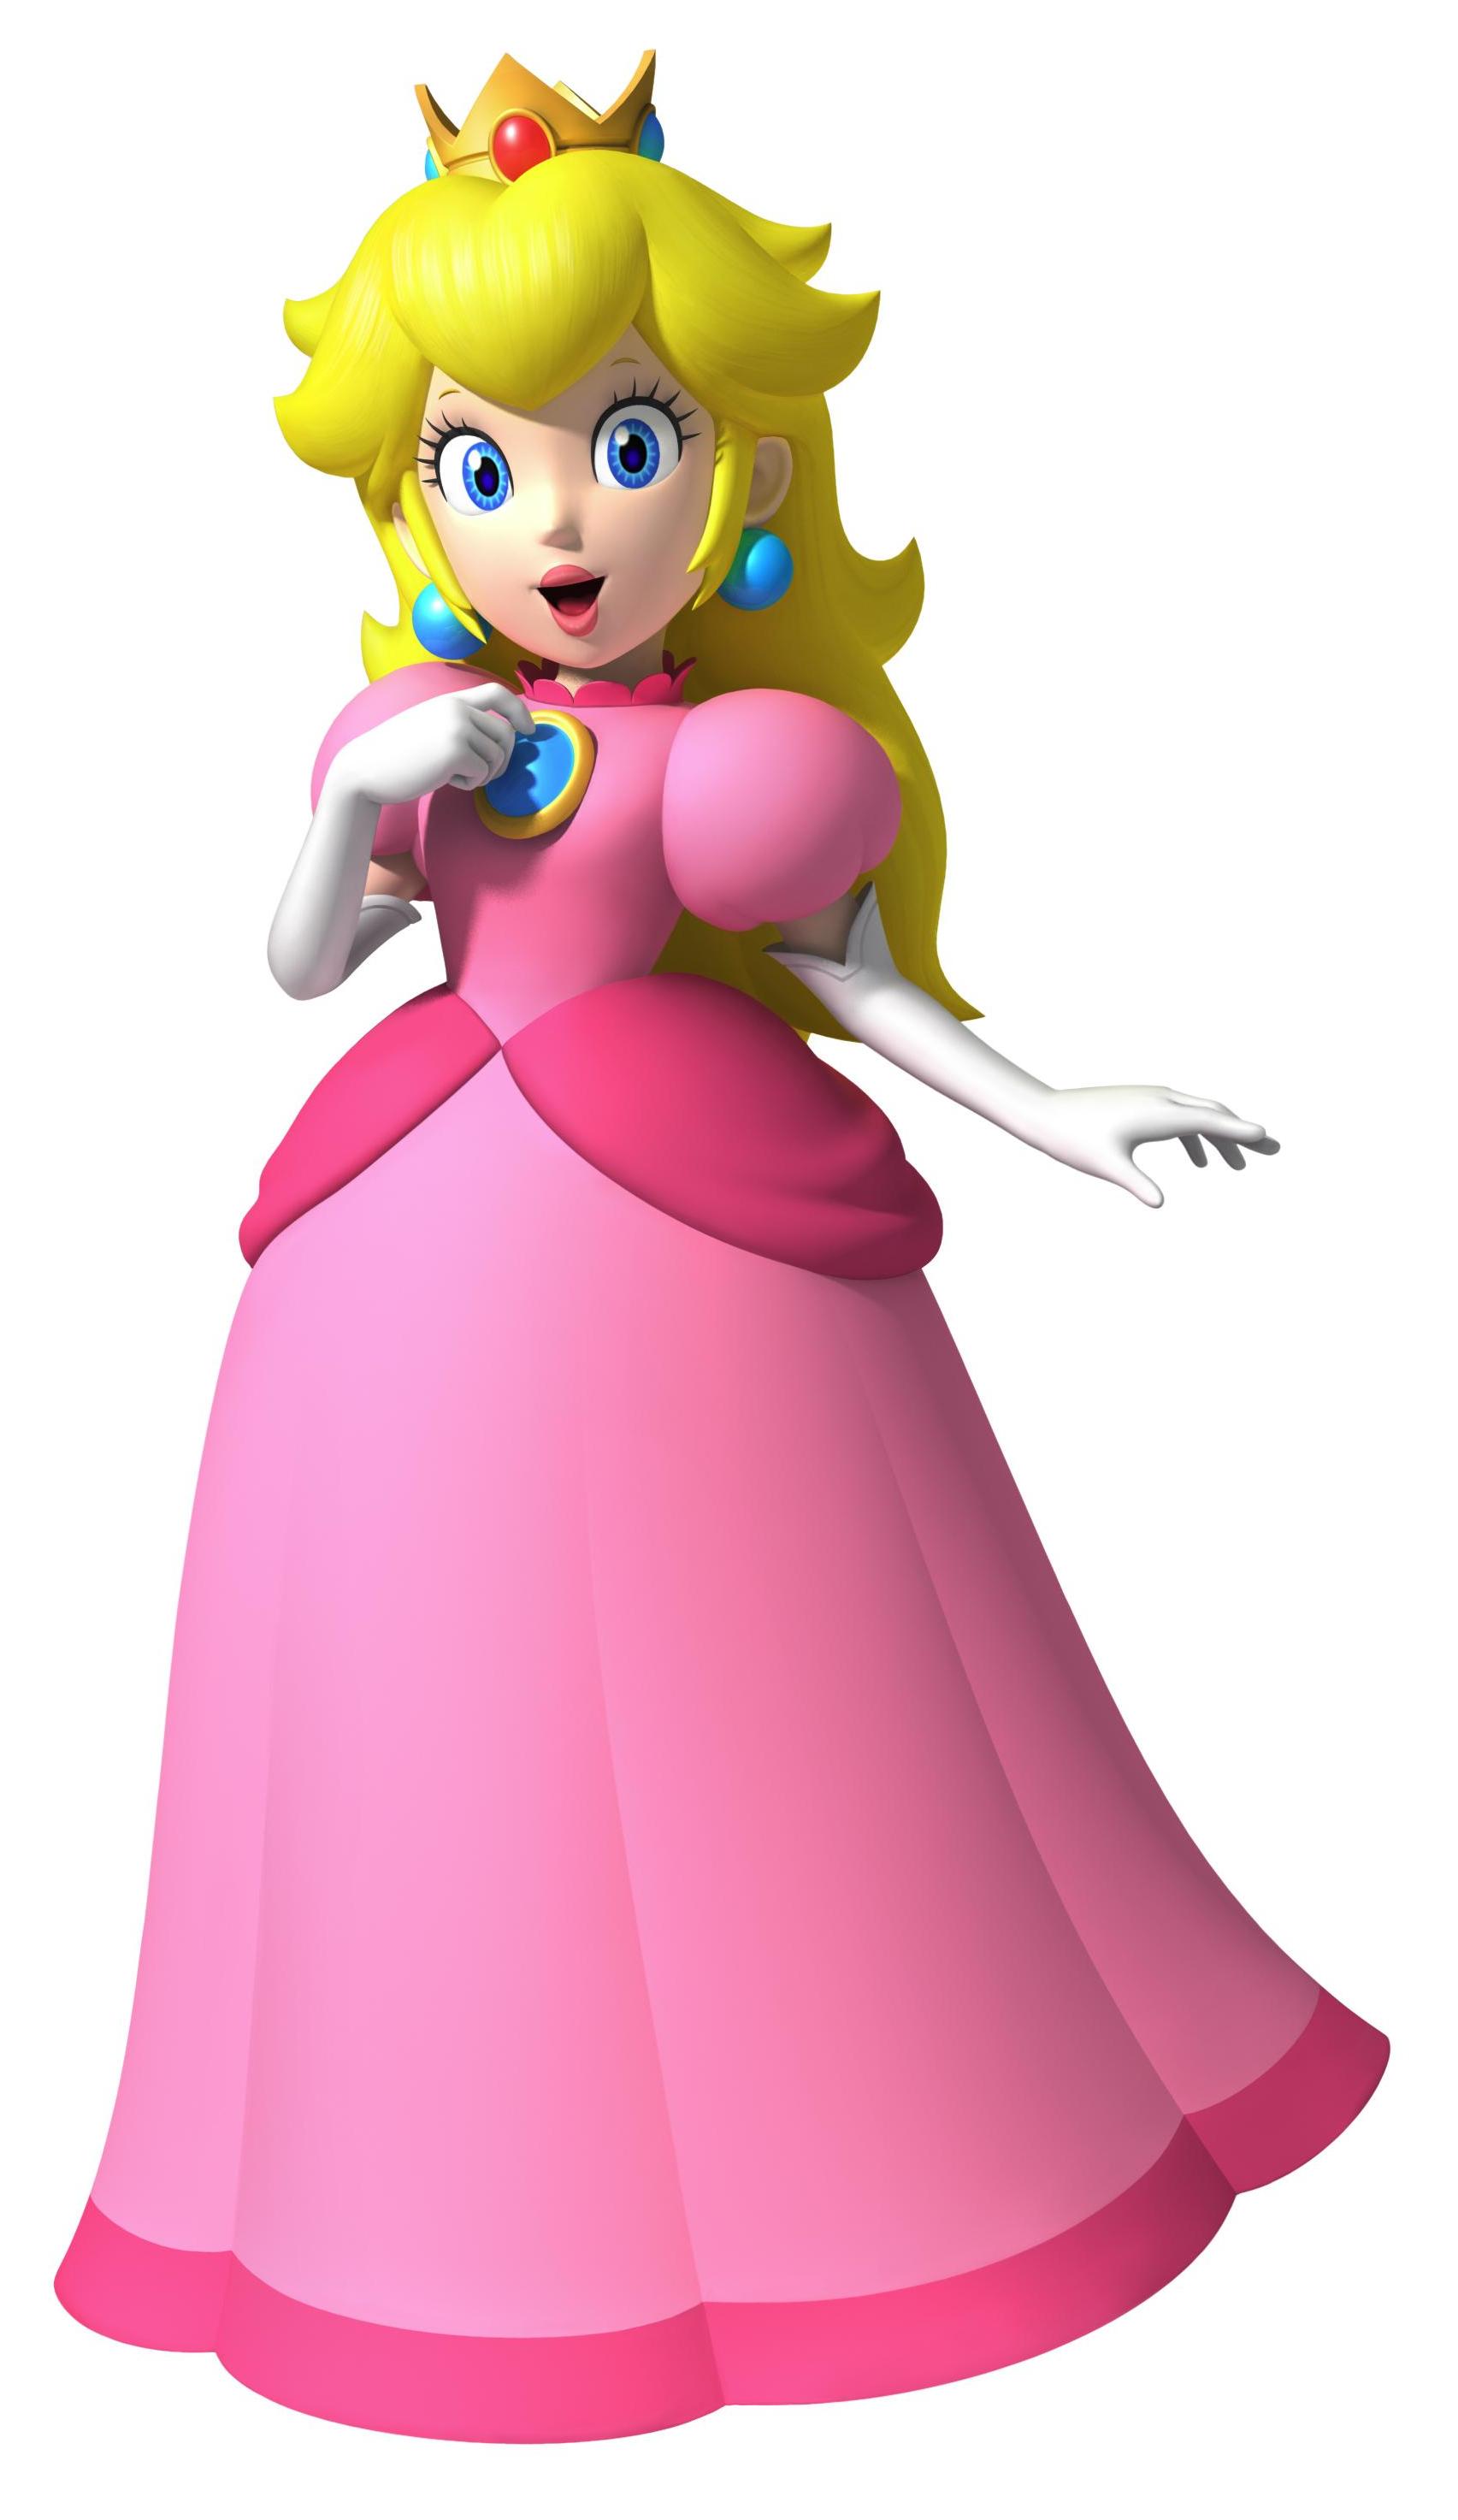 Peach Prinzessin